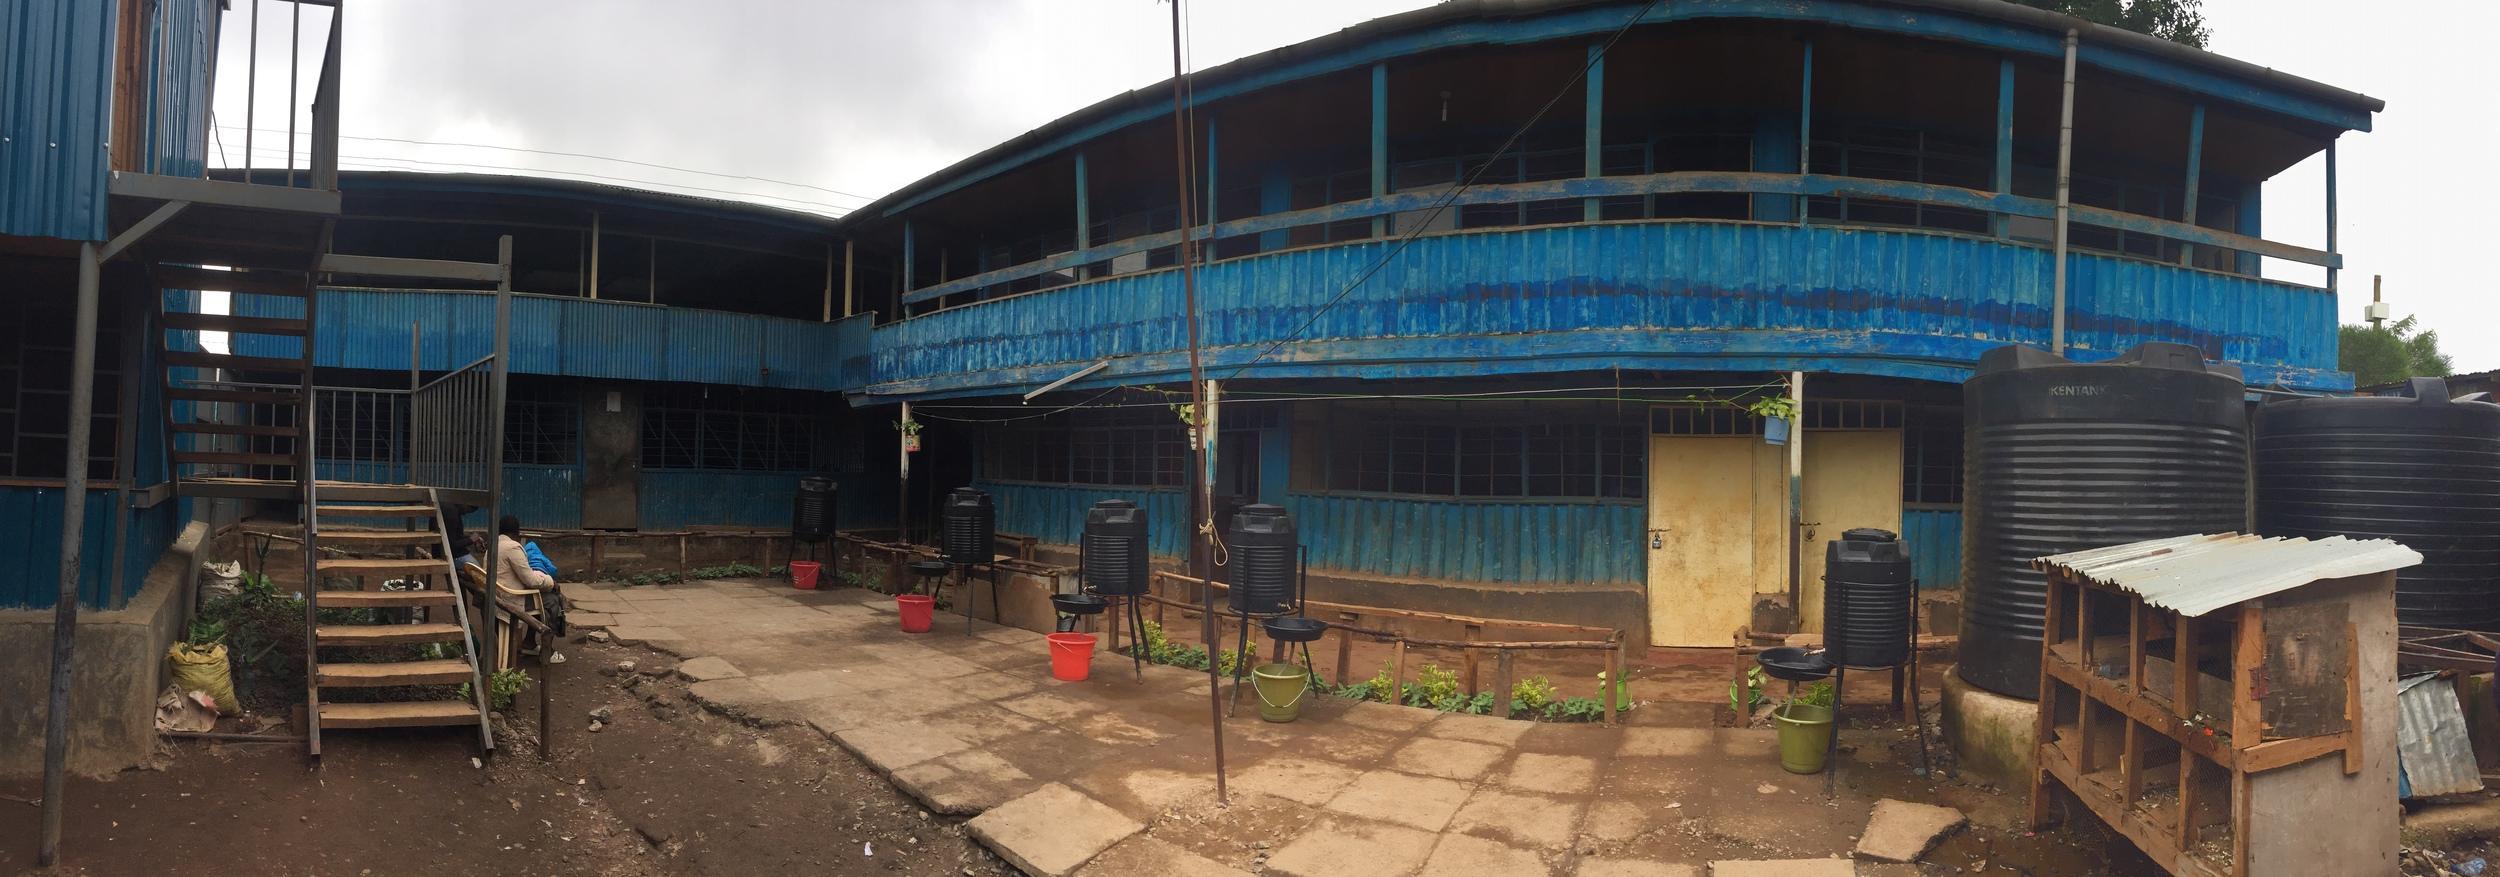 New Adventure School, Kibera